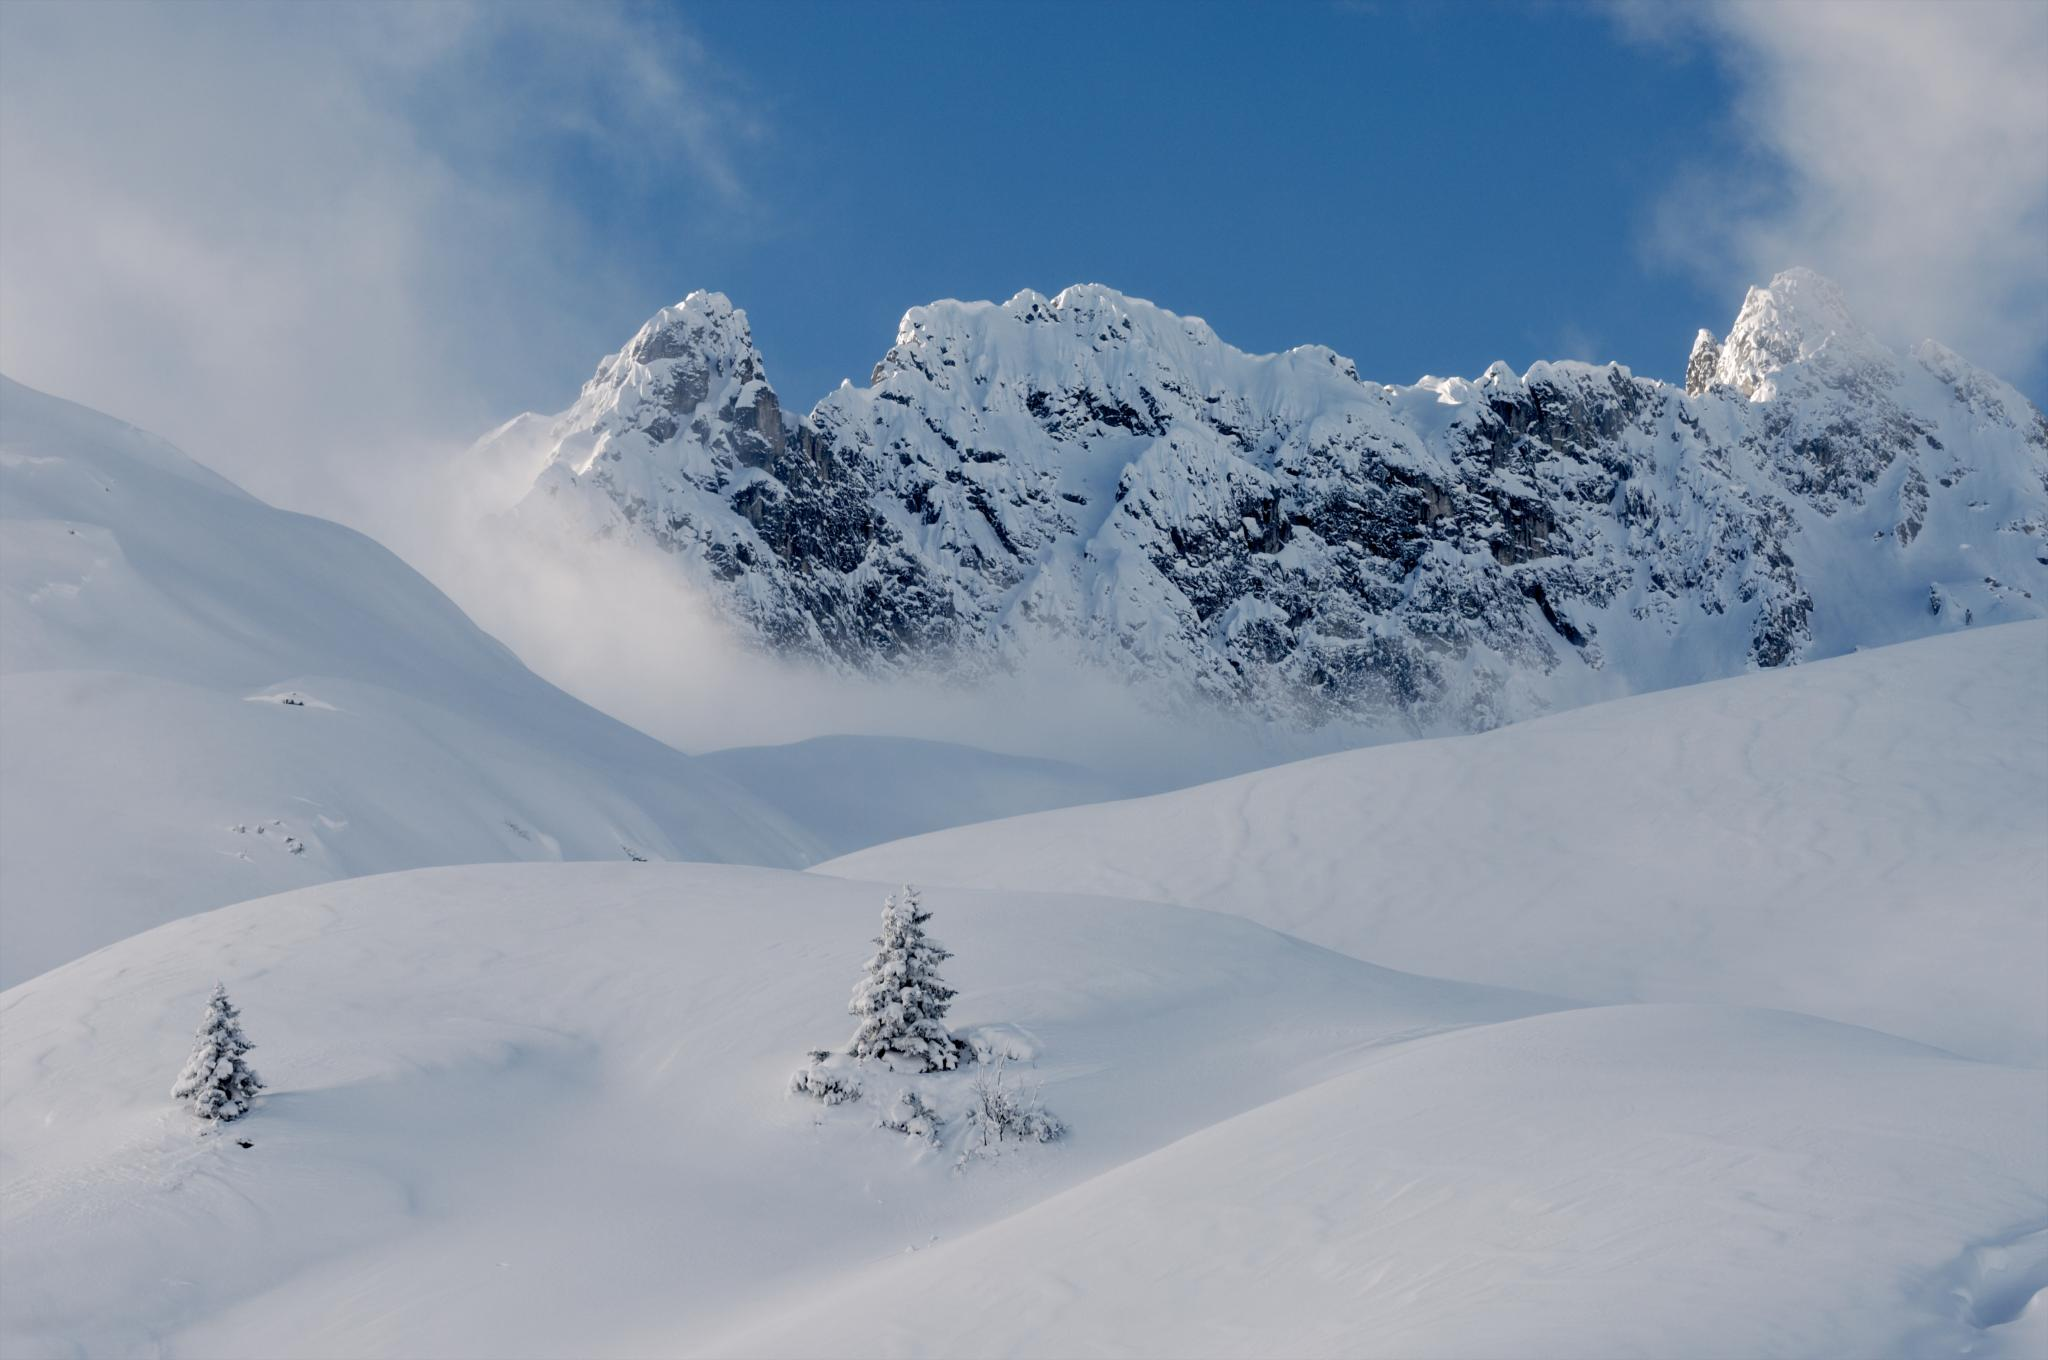 Schnee Berge Skifahrer Zürs Lech